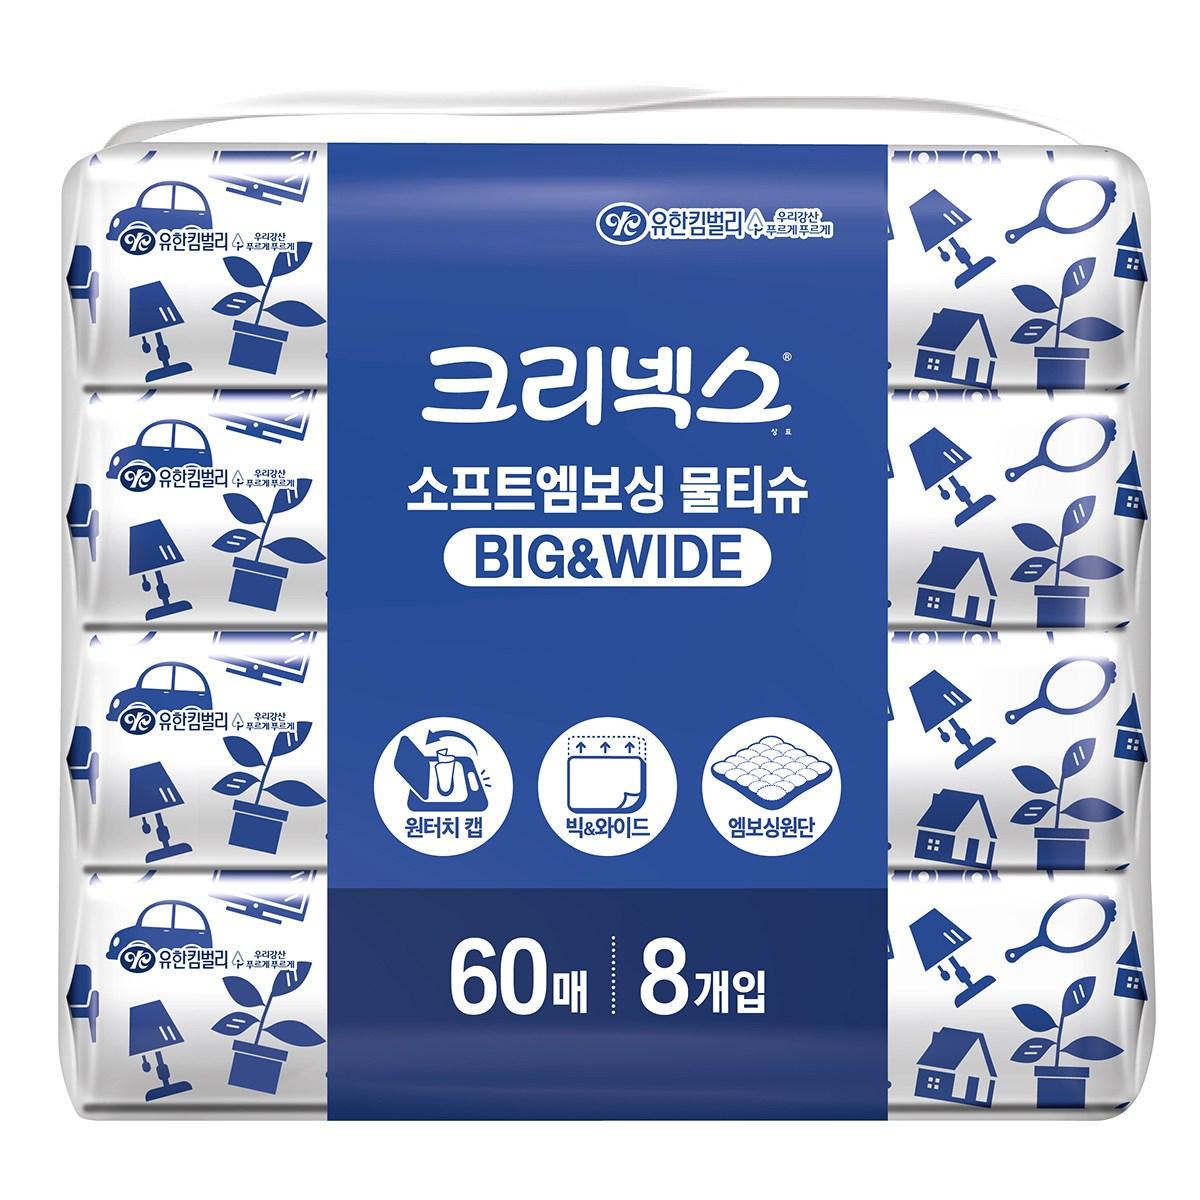 Kleenex [코스트코 무료직배송]소프트 엠보싱 물티슈 60매x 8 x 2팩 대용량 캠핑장 여행 사무실 집안에서, 16개입